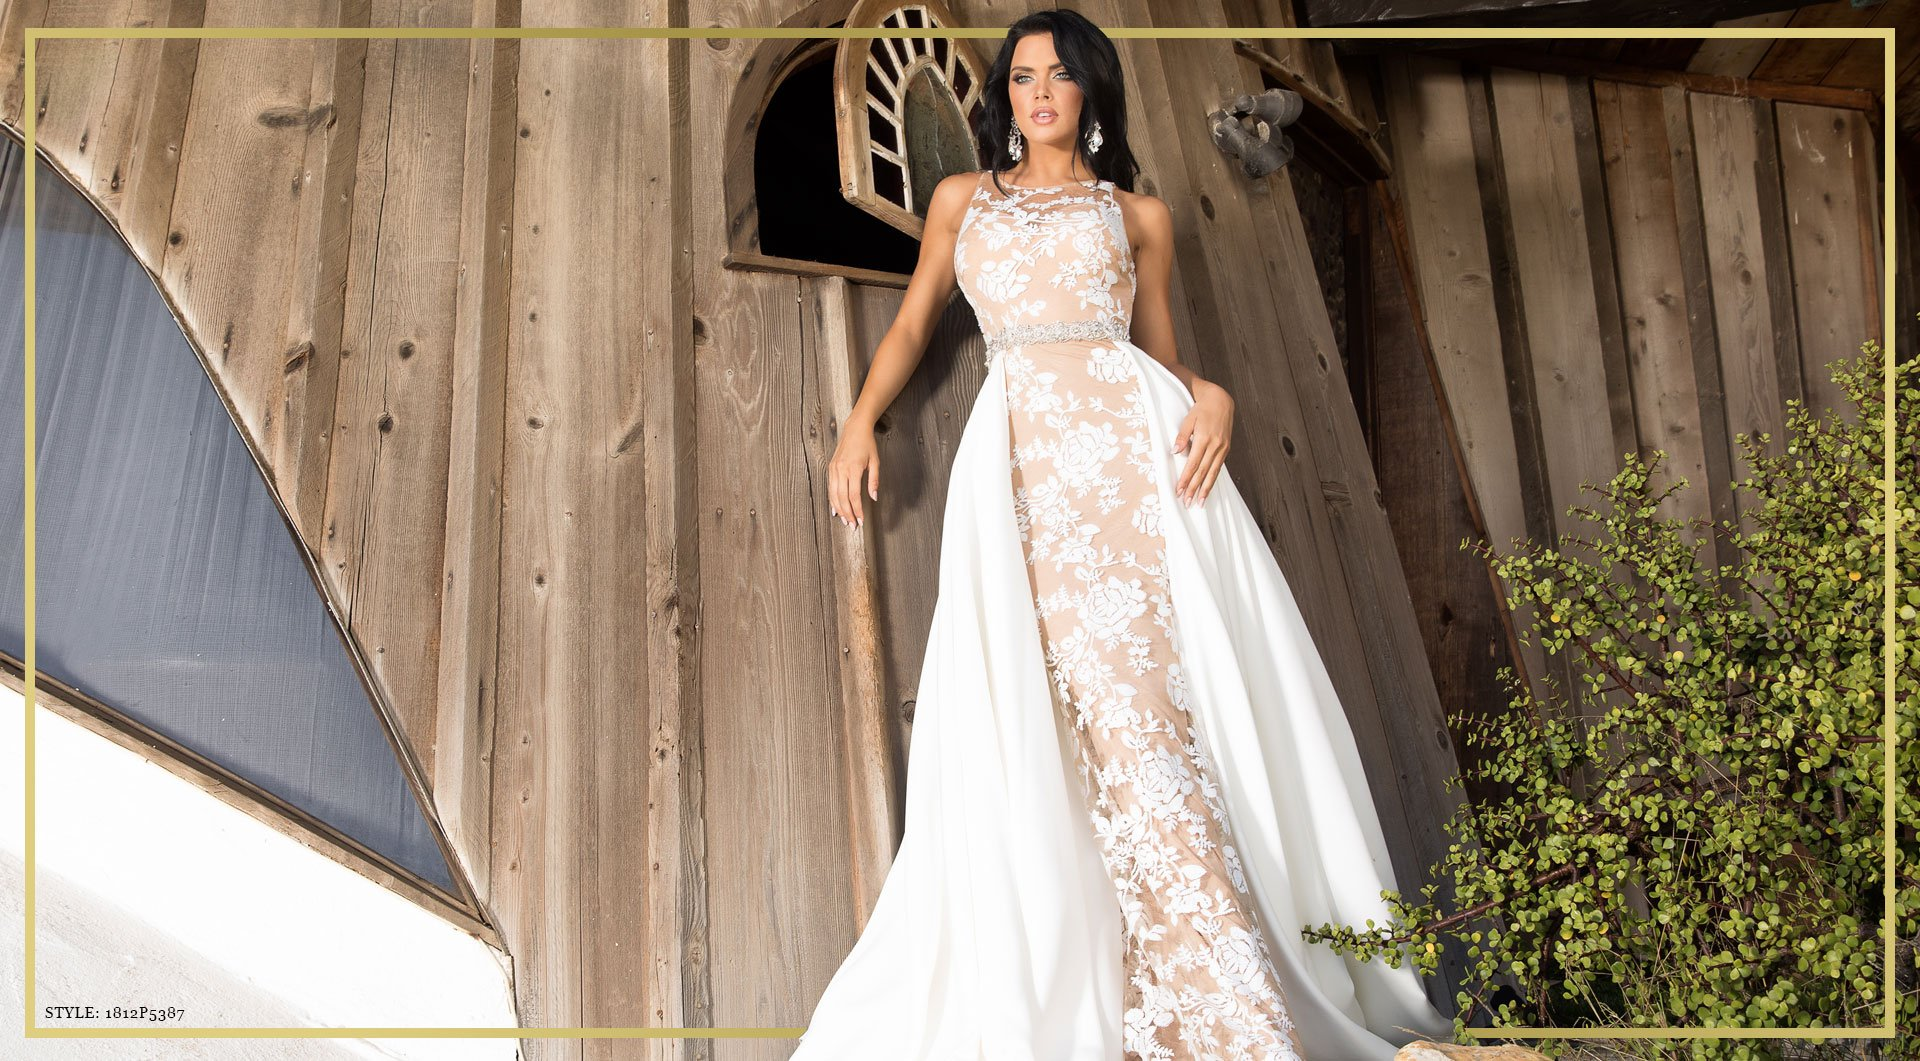 Prom dresses 34th street nyc zola